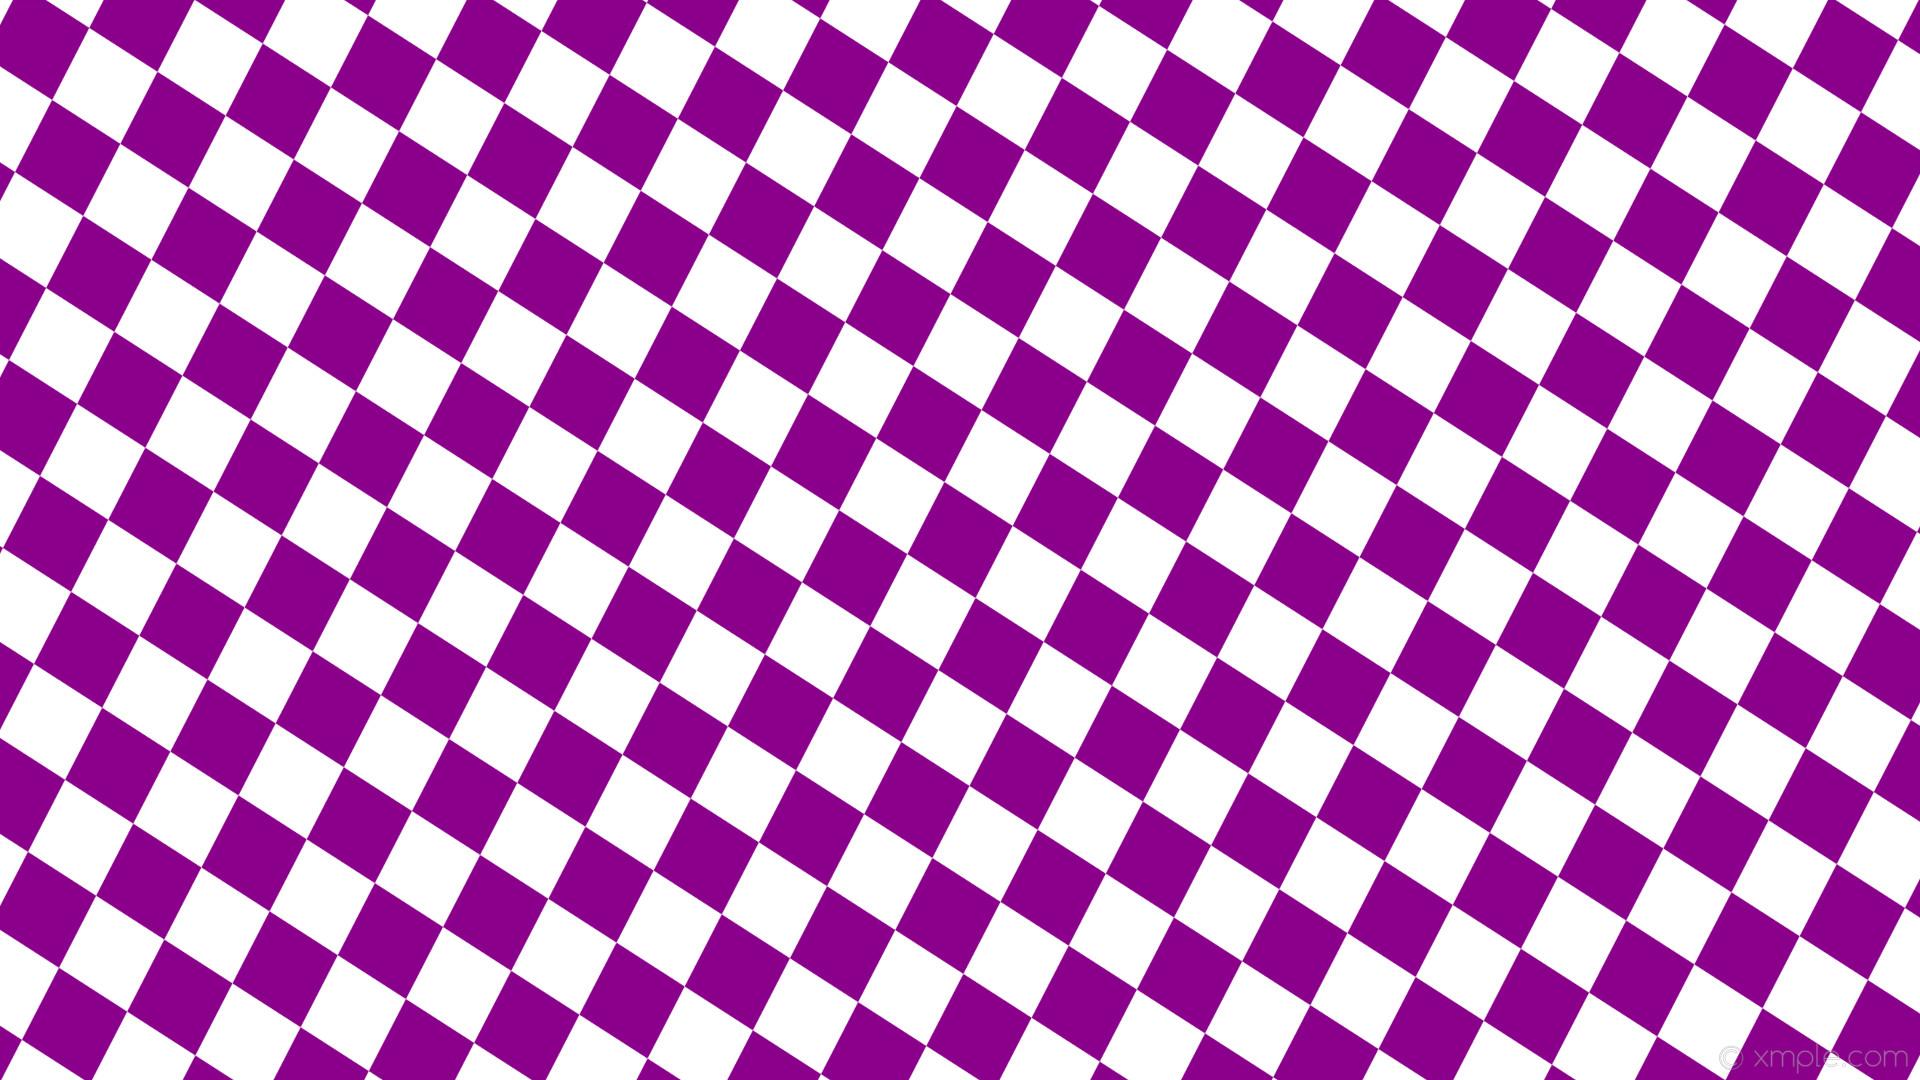 wallpaper white diamond rhombus lozenge purple dark magenta #8b008b #ffffff  105° 120px 109px